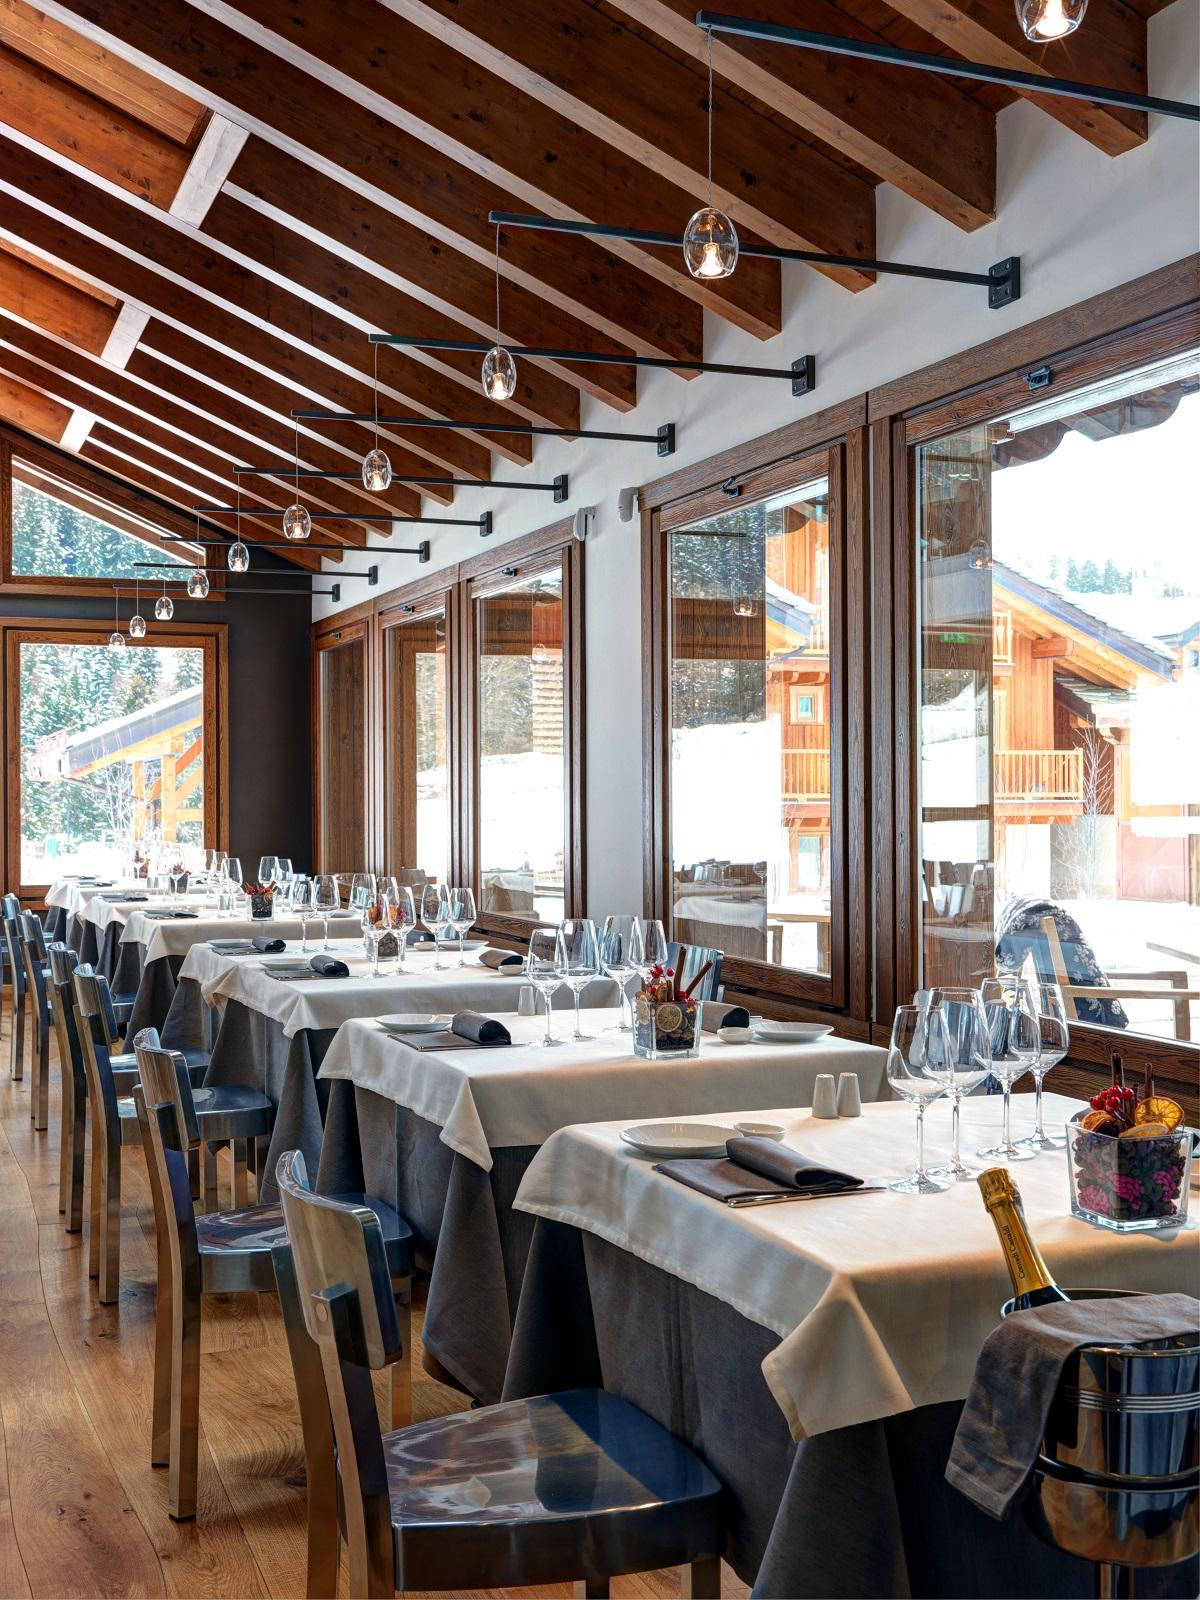 konyhasziget_teli_luxus_hotel_nira_montana_restaurant.jpg